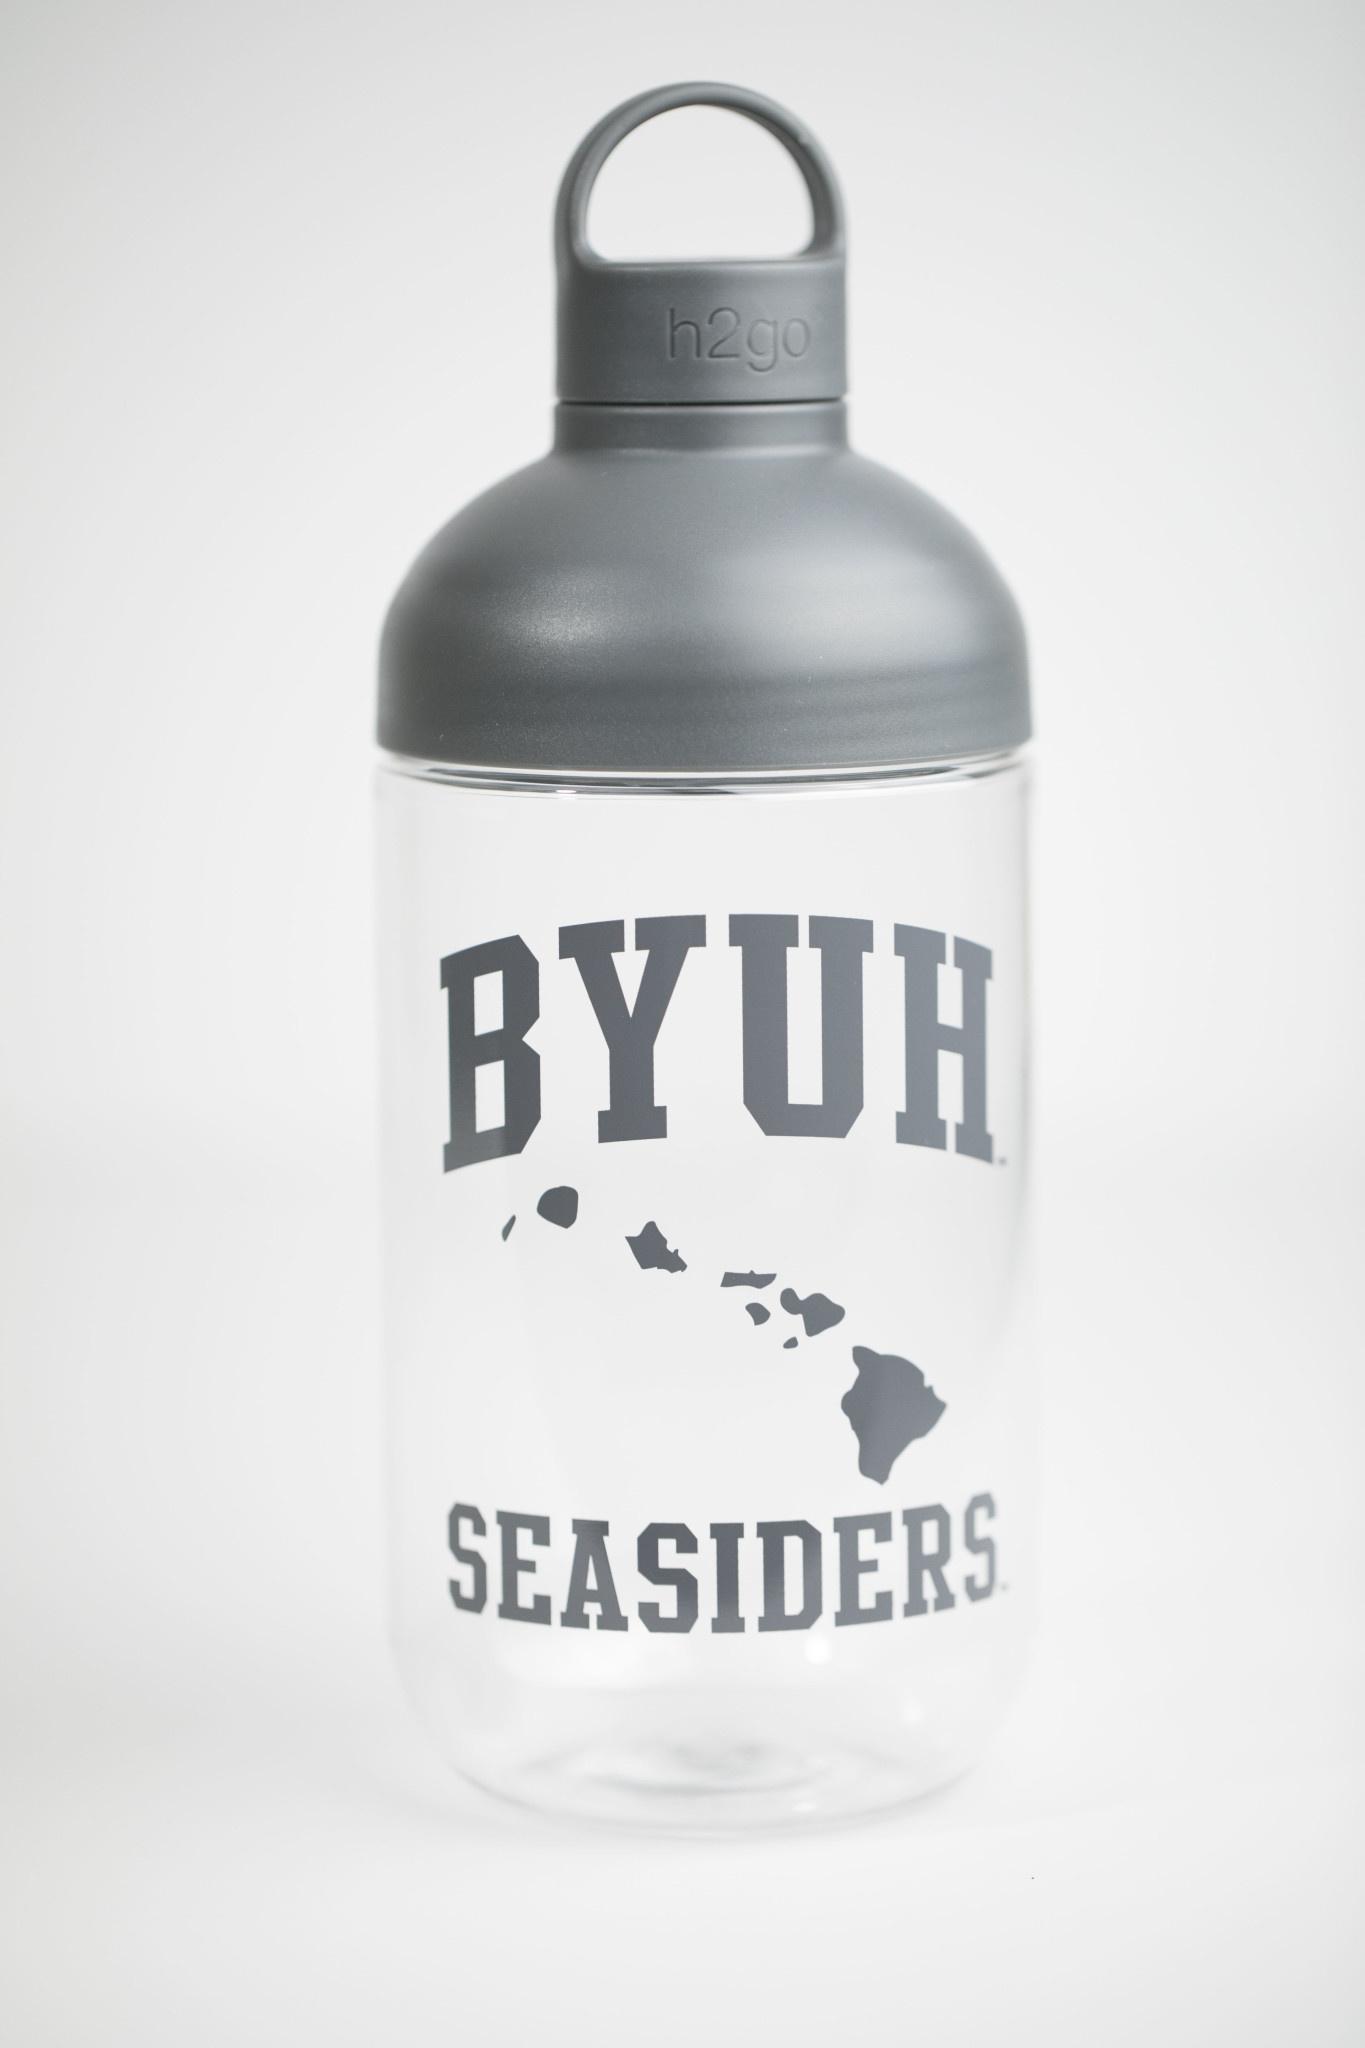 BYUH Bottle Capsule